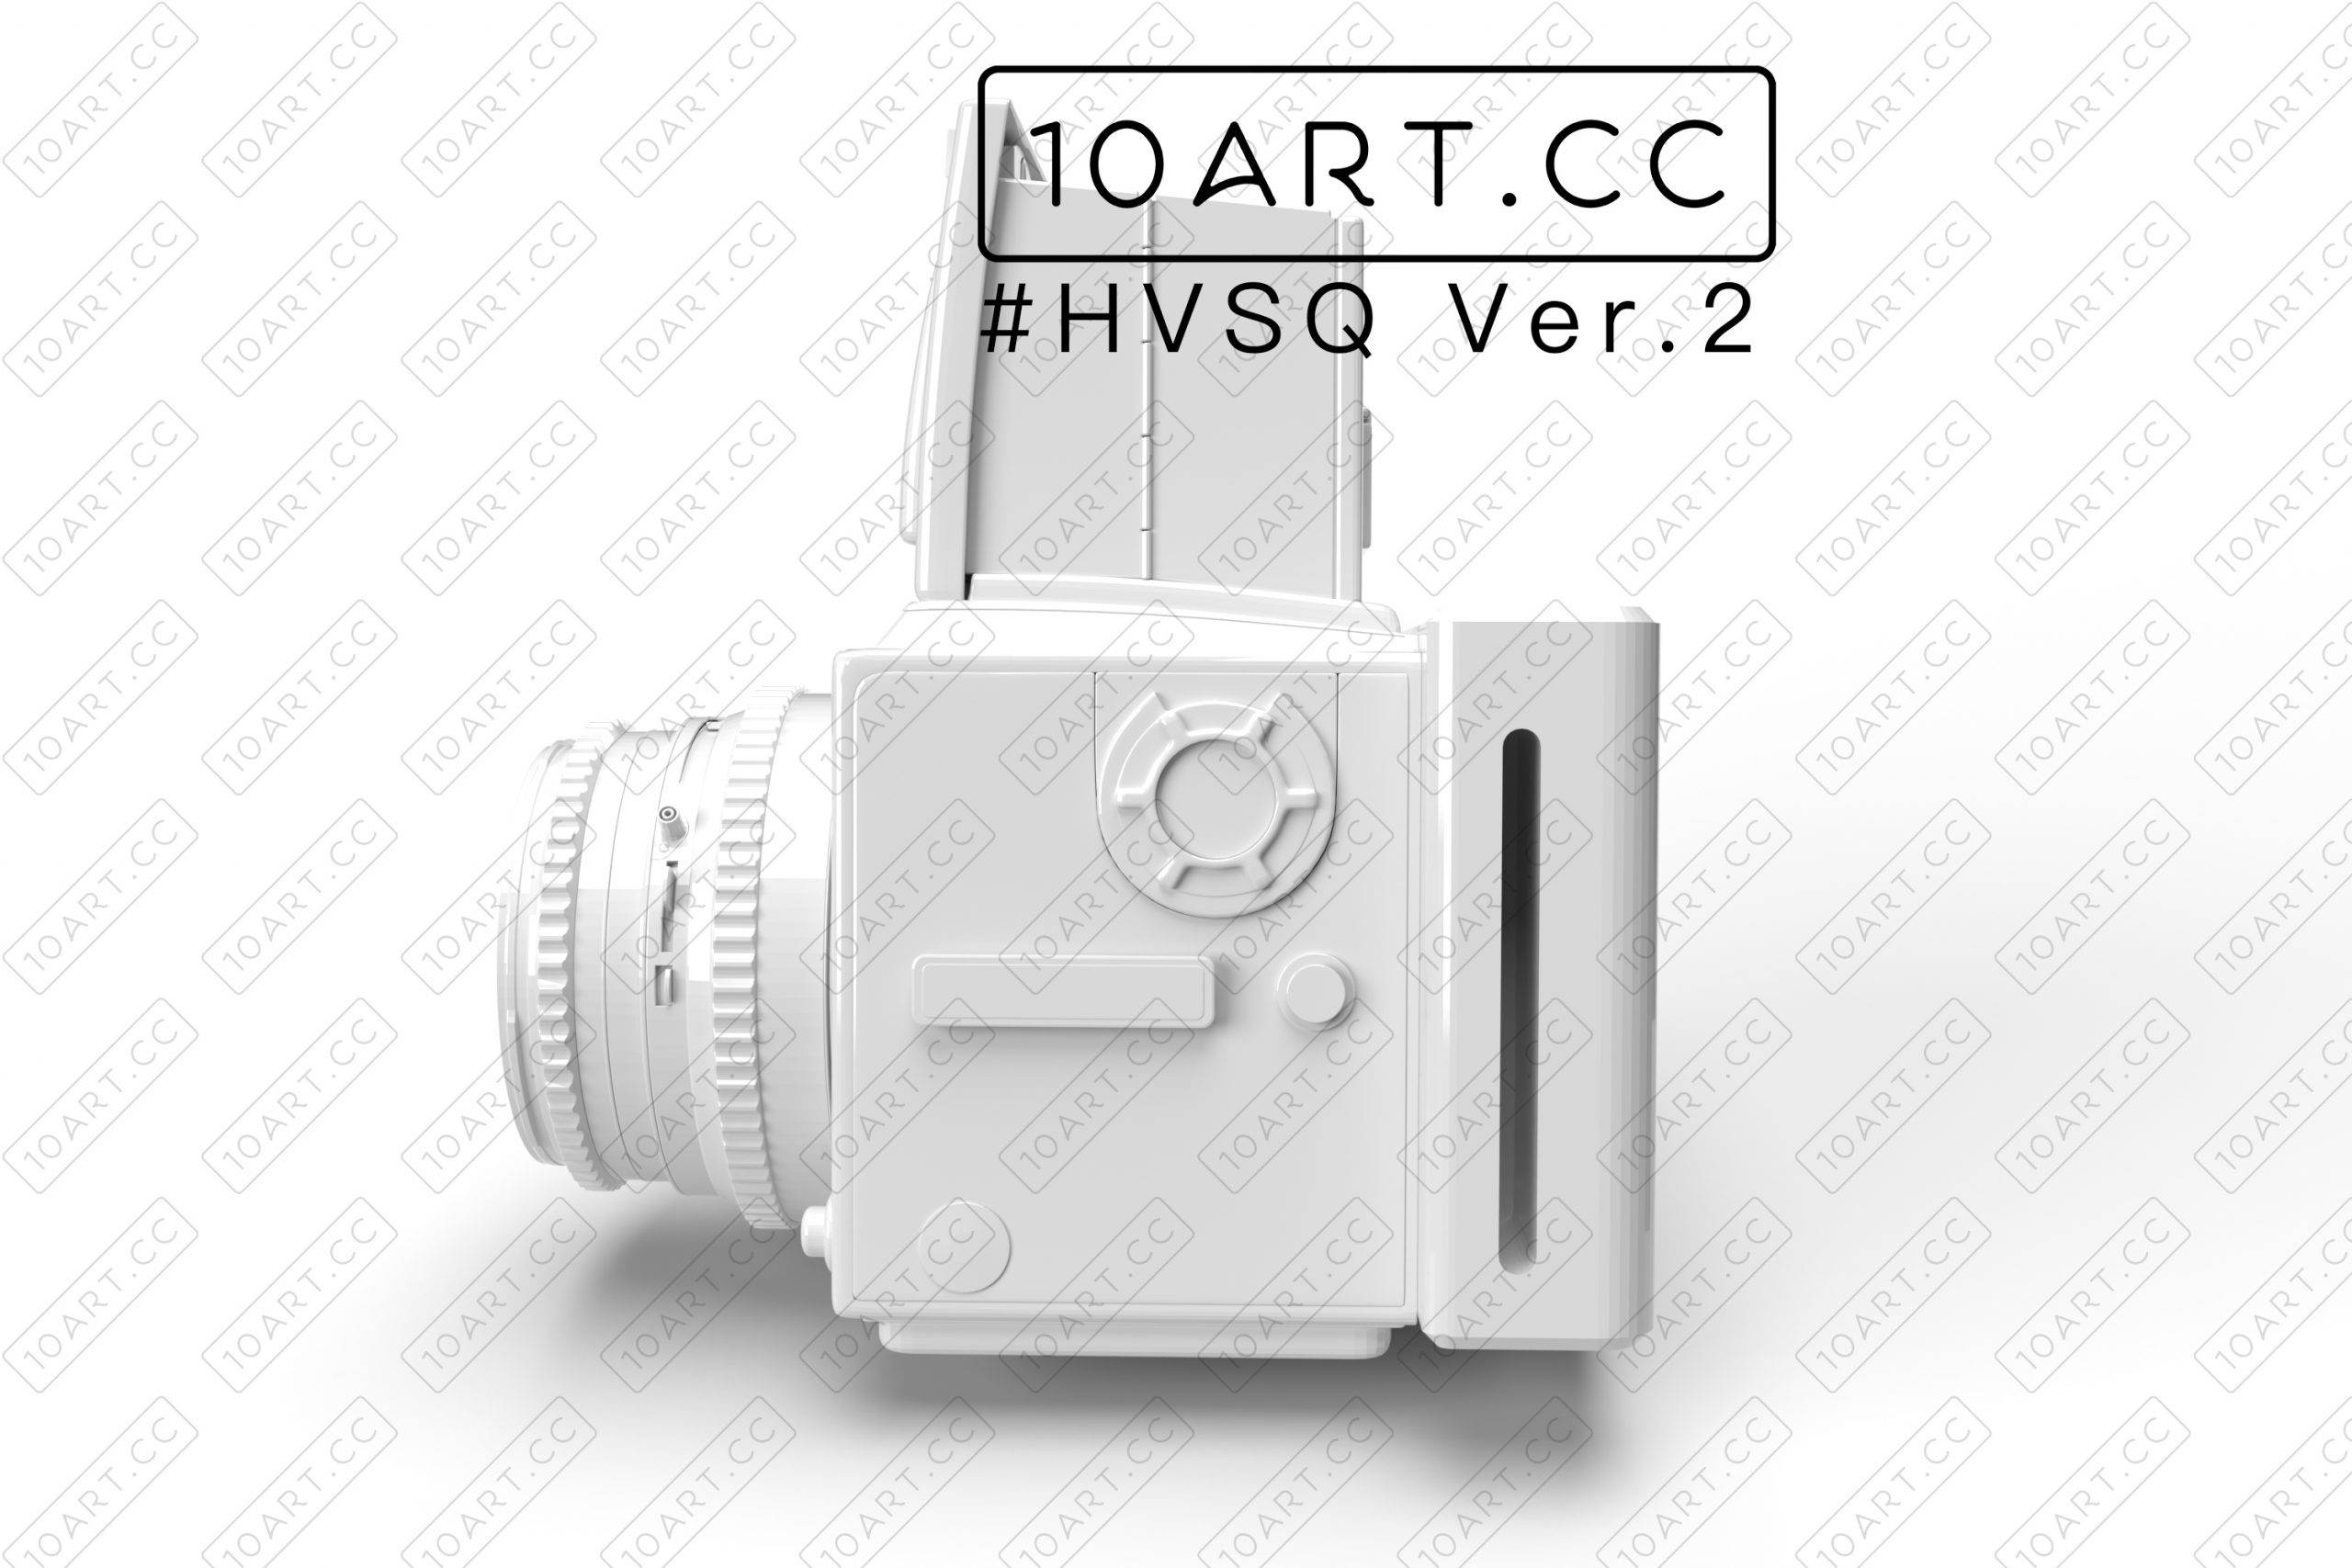 #HVSQ Ver.2 哈苏拍立得后背-10ARTCC